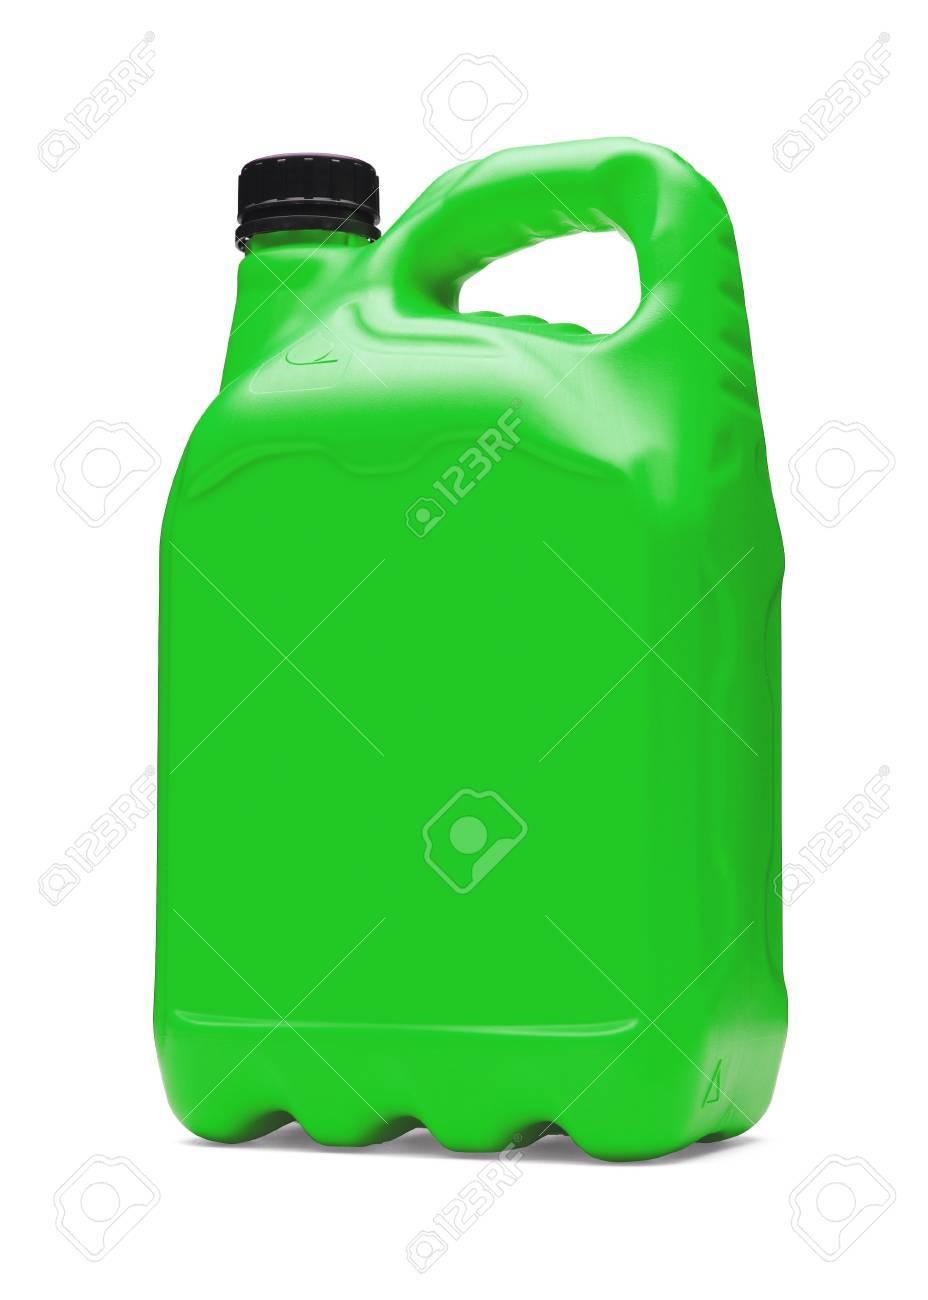 bottle green, ecology, plastic tank - 11771381